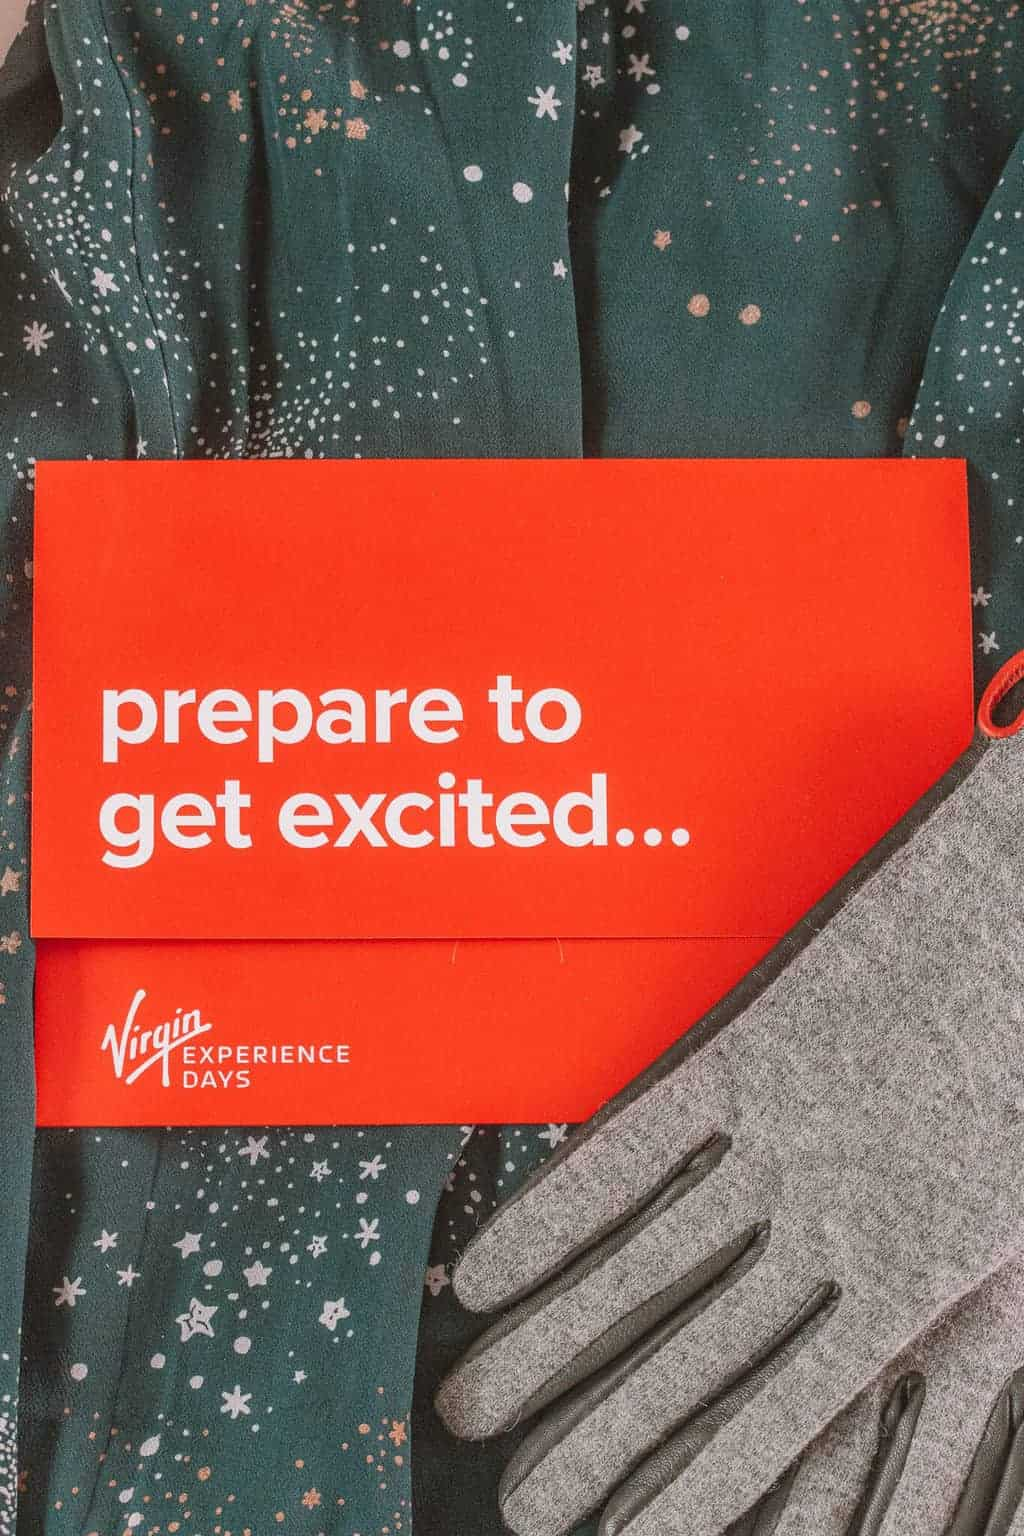 Virgin Experiences - Christmas Gift Guide 2018: Brilliant Christmas Gift Ideas For Her #whatshotblog